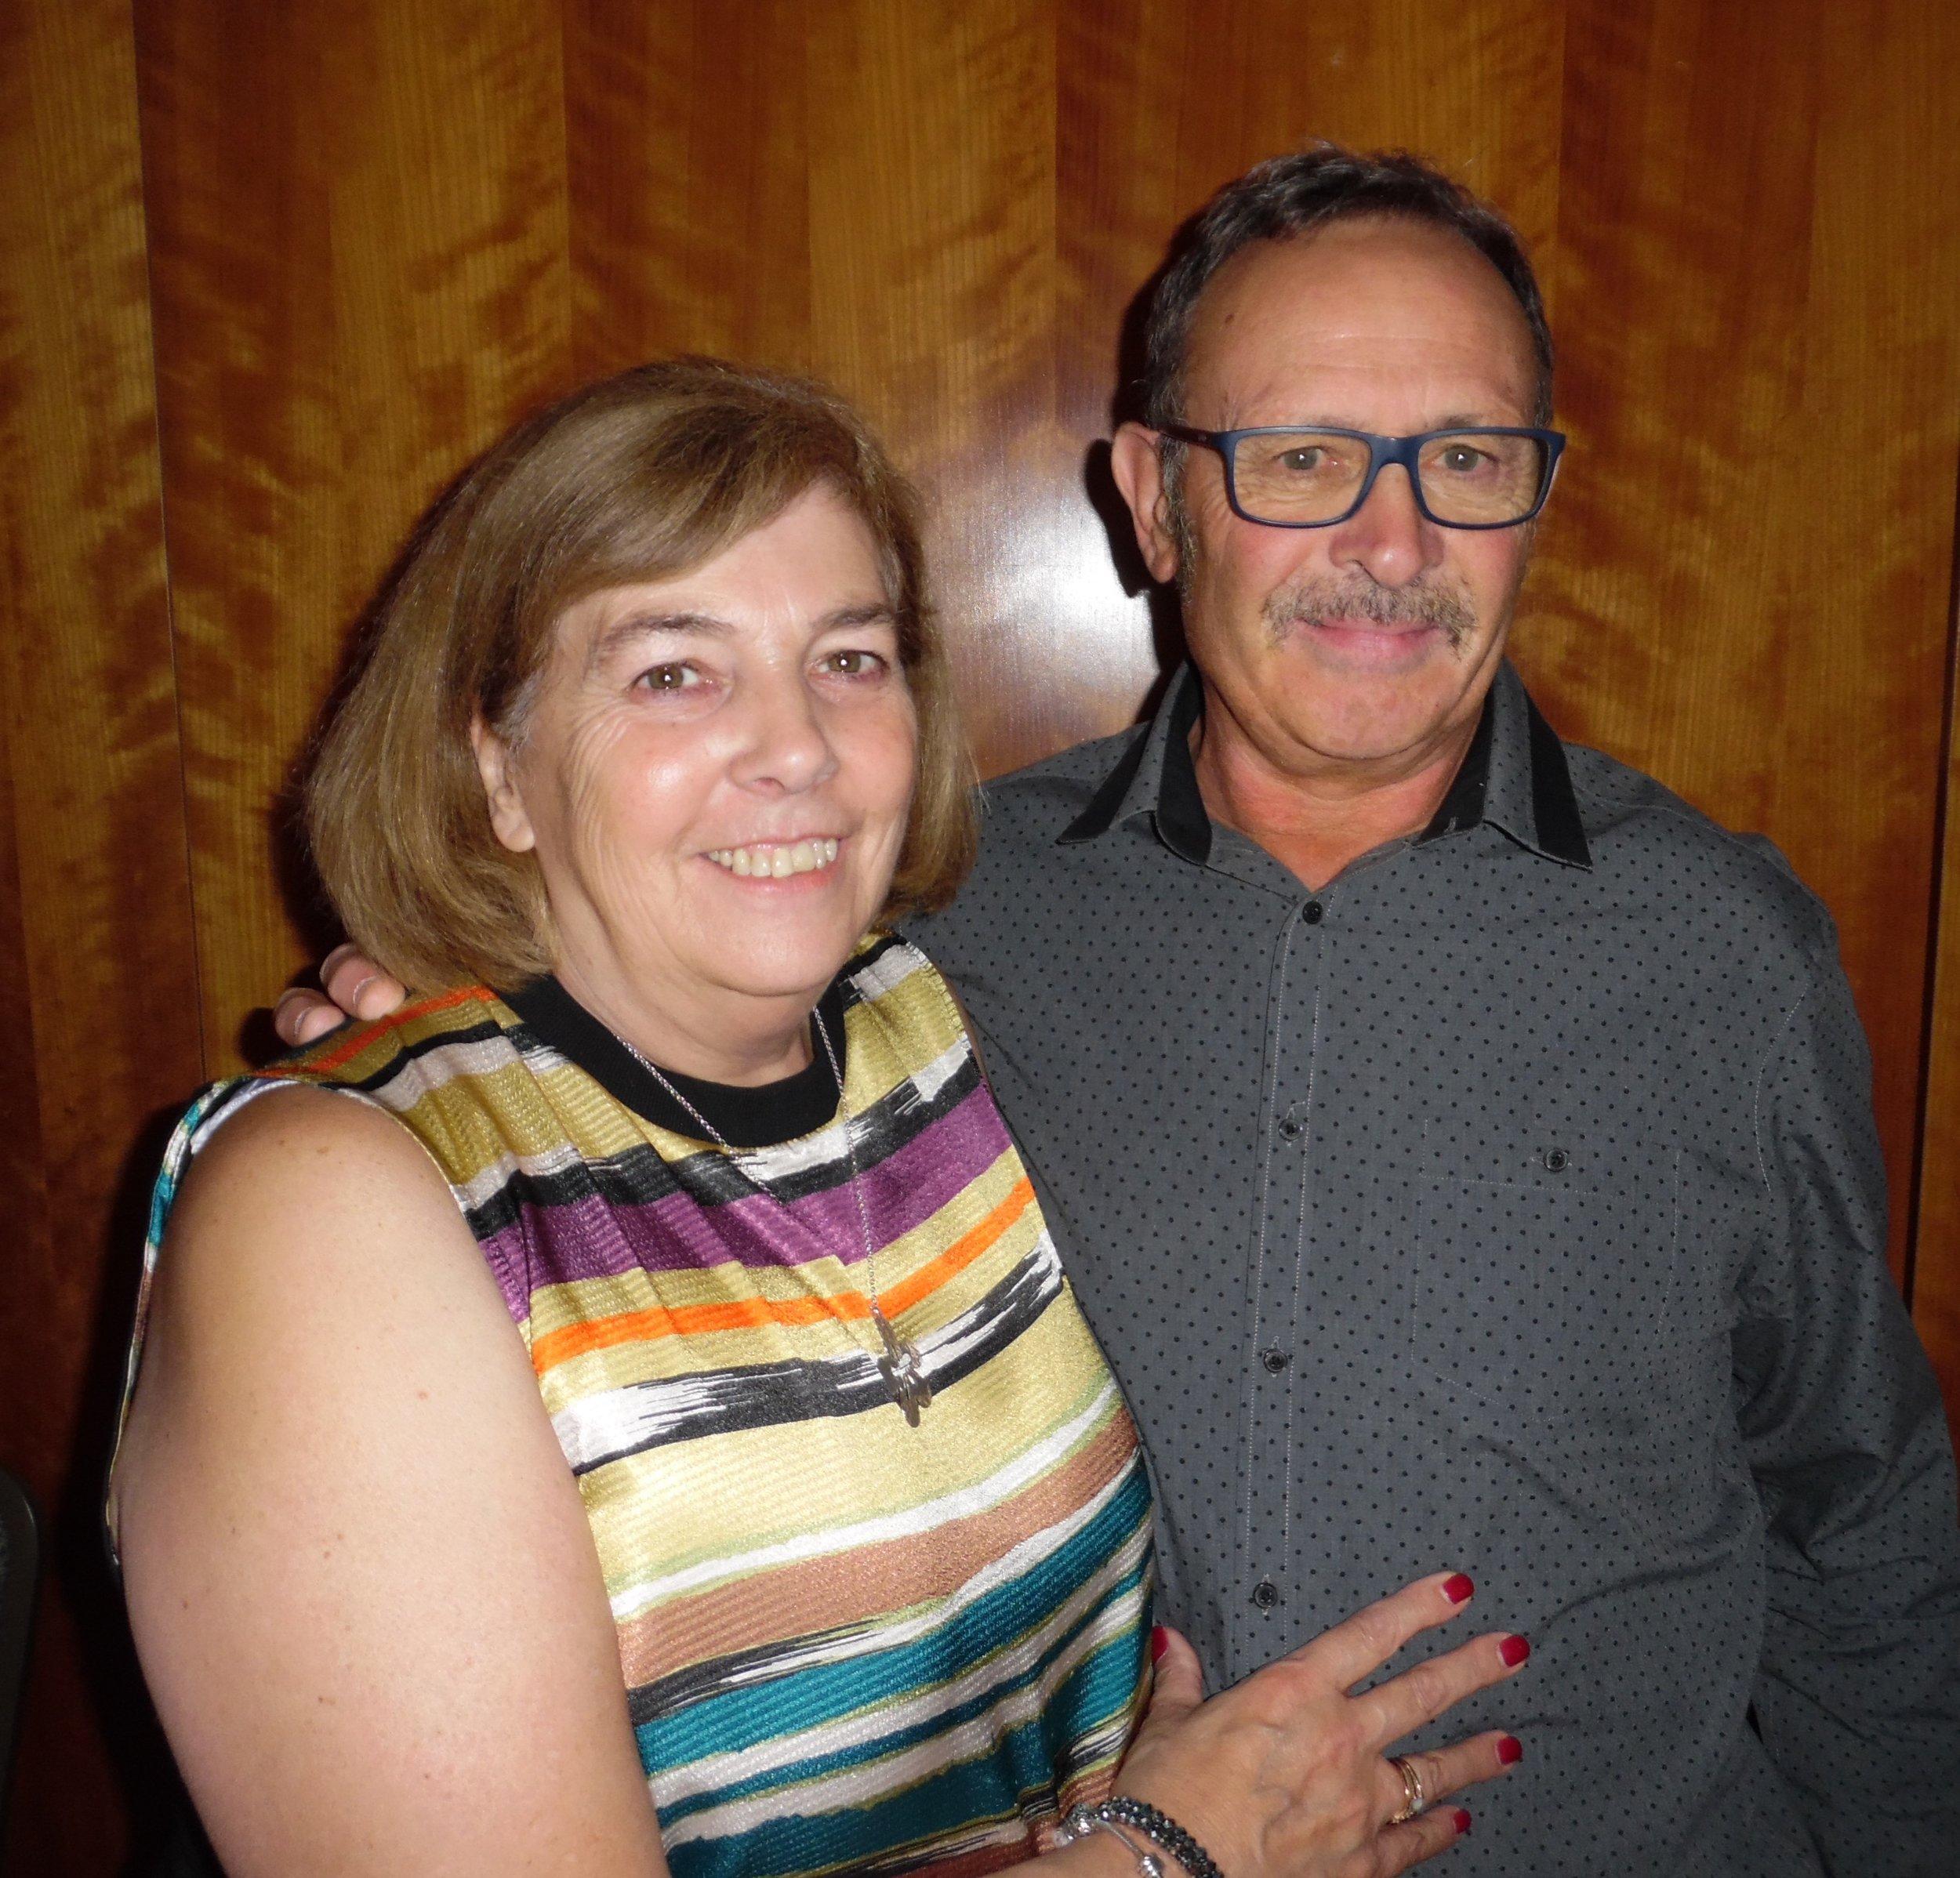 David Regan, ETA Gordon Hendricks' Road Manager, and his wife Linda, who helps with costumes and merchandising.